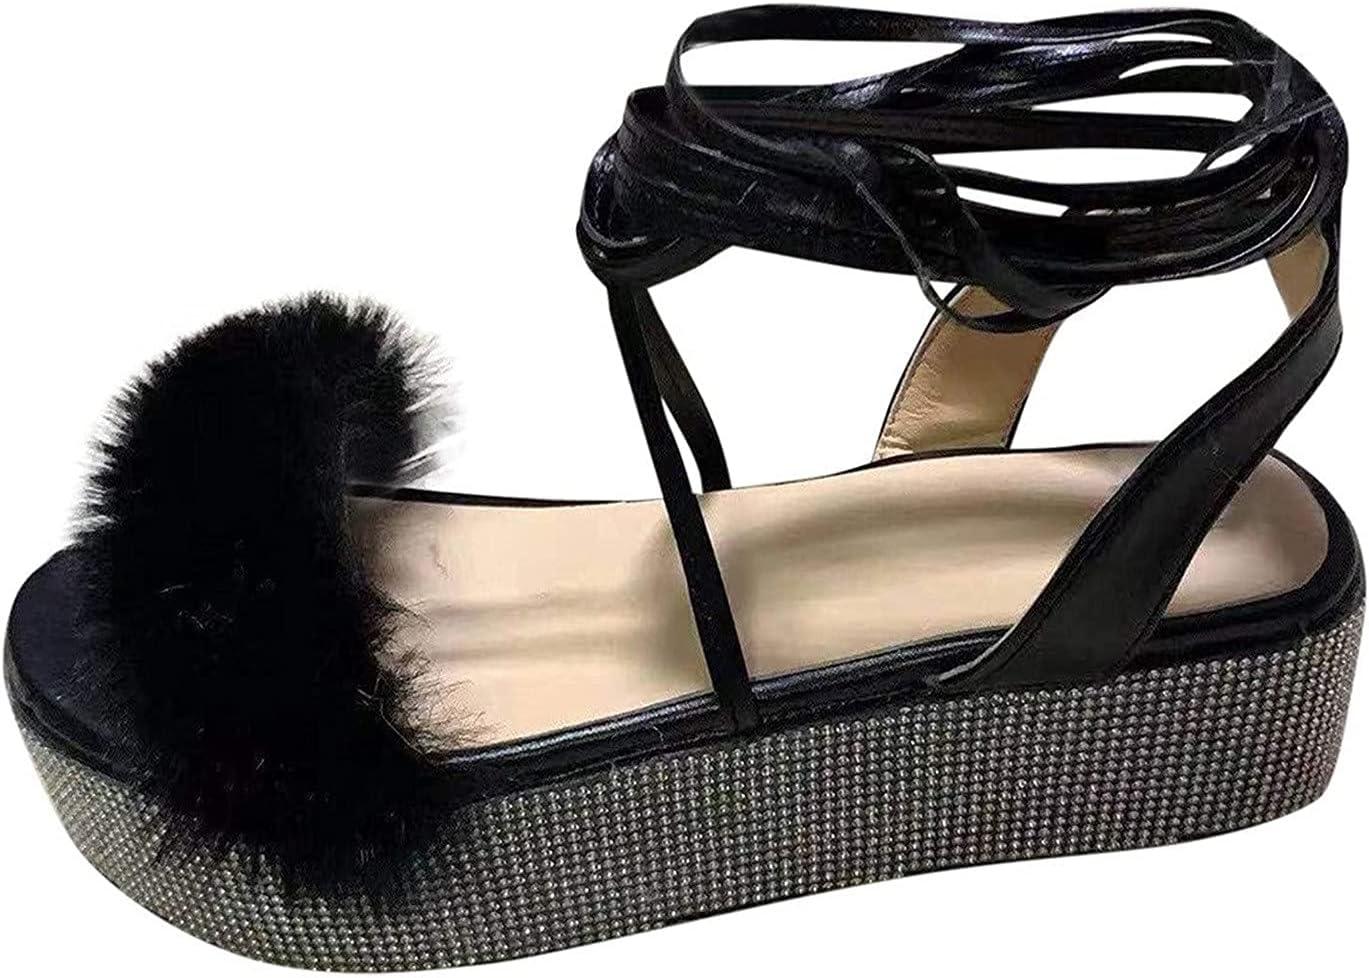 kakina Leg Wraps Bandage Sandals for Women Casual Summer Platform Sandals Furry Rhinestone Sandals Wedge Slide Sandals with Arch Support